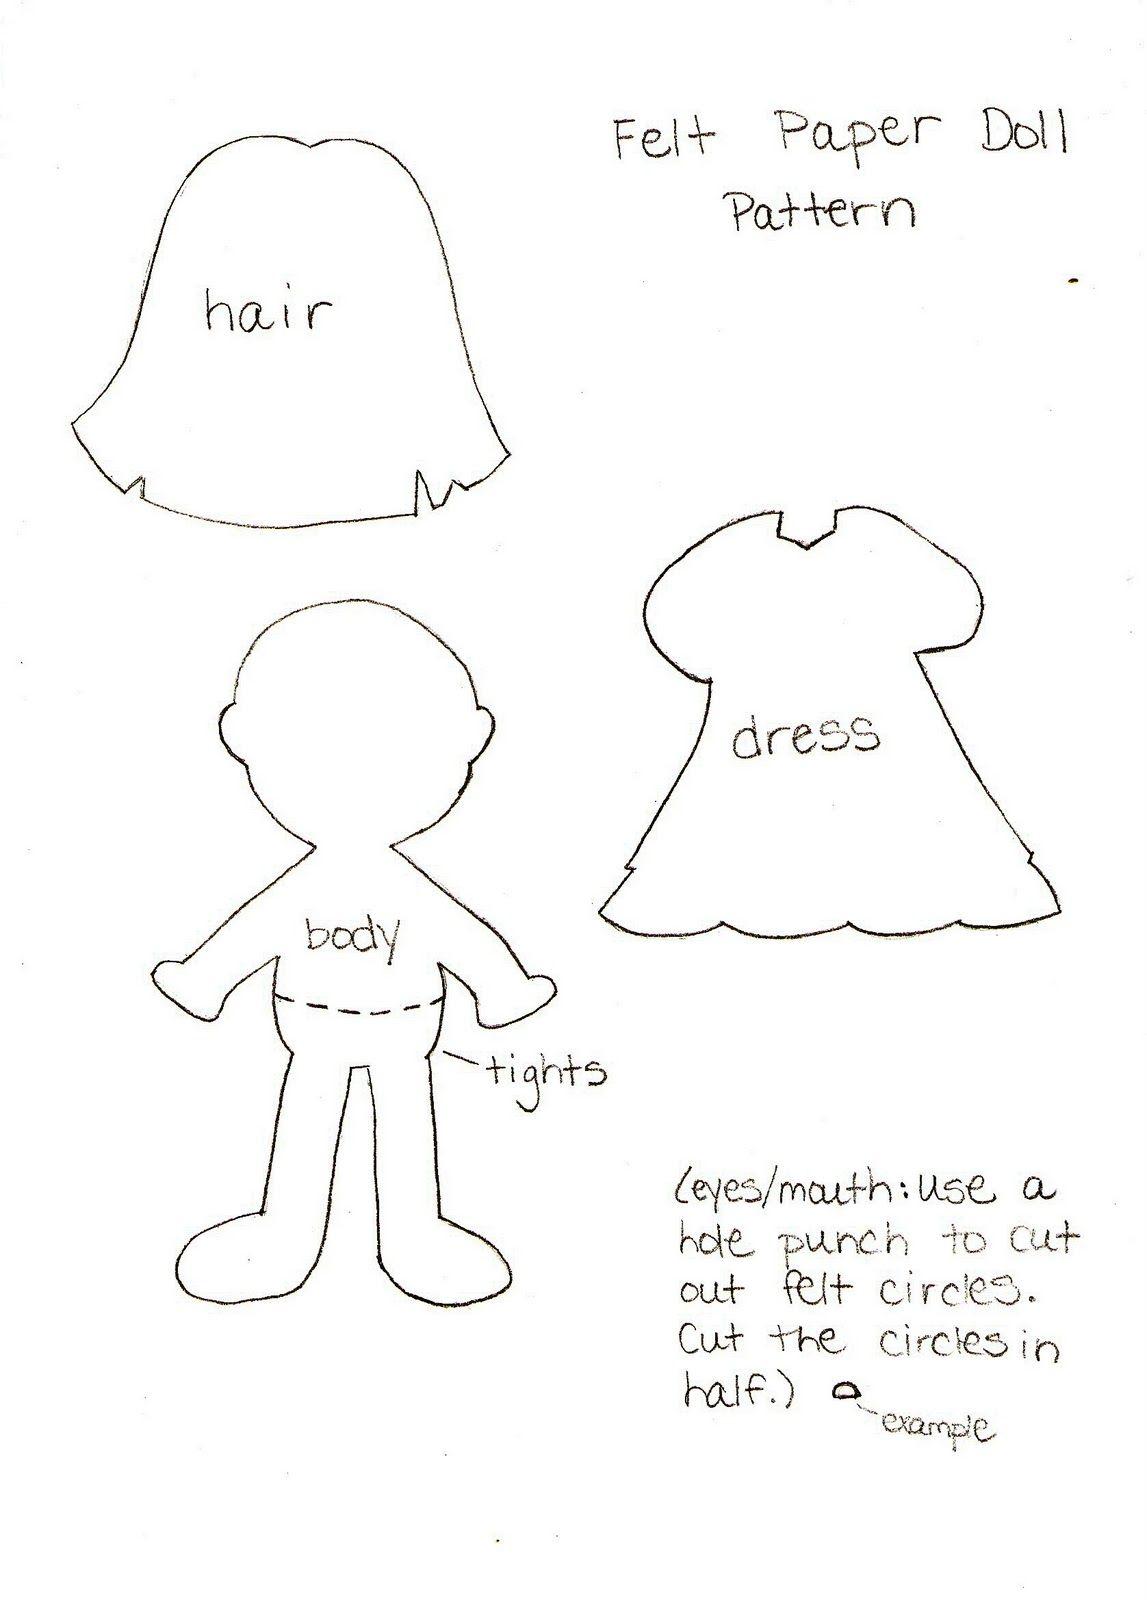 Felt Paper Doll Pattern | Crochet | Pinterest | Dolls, Patterns and ...